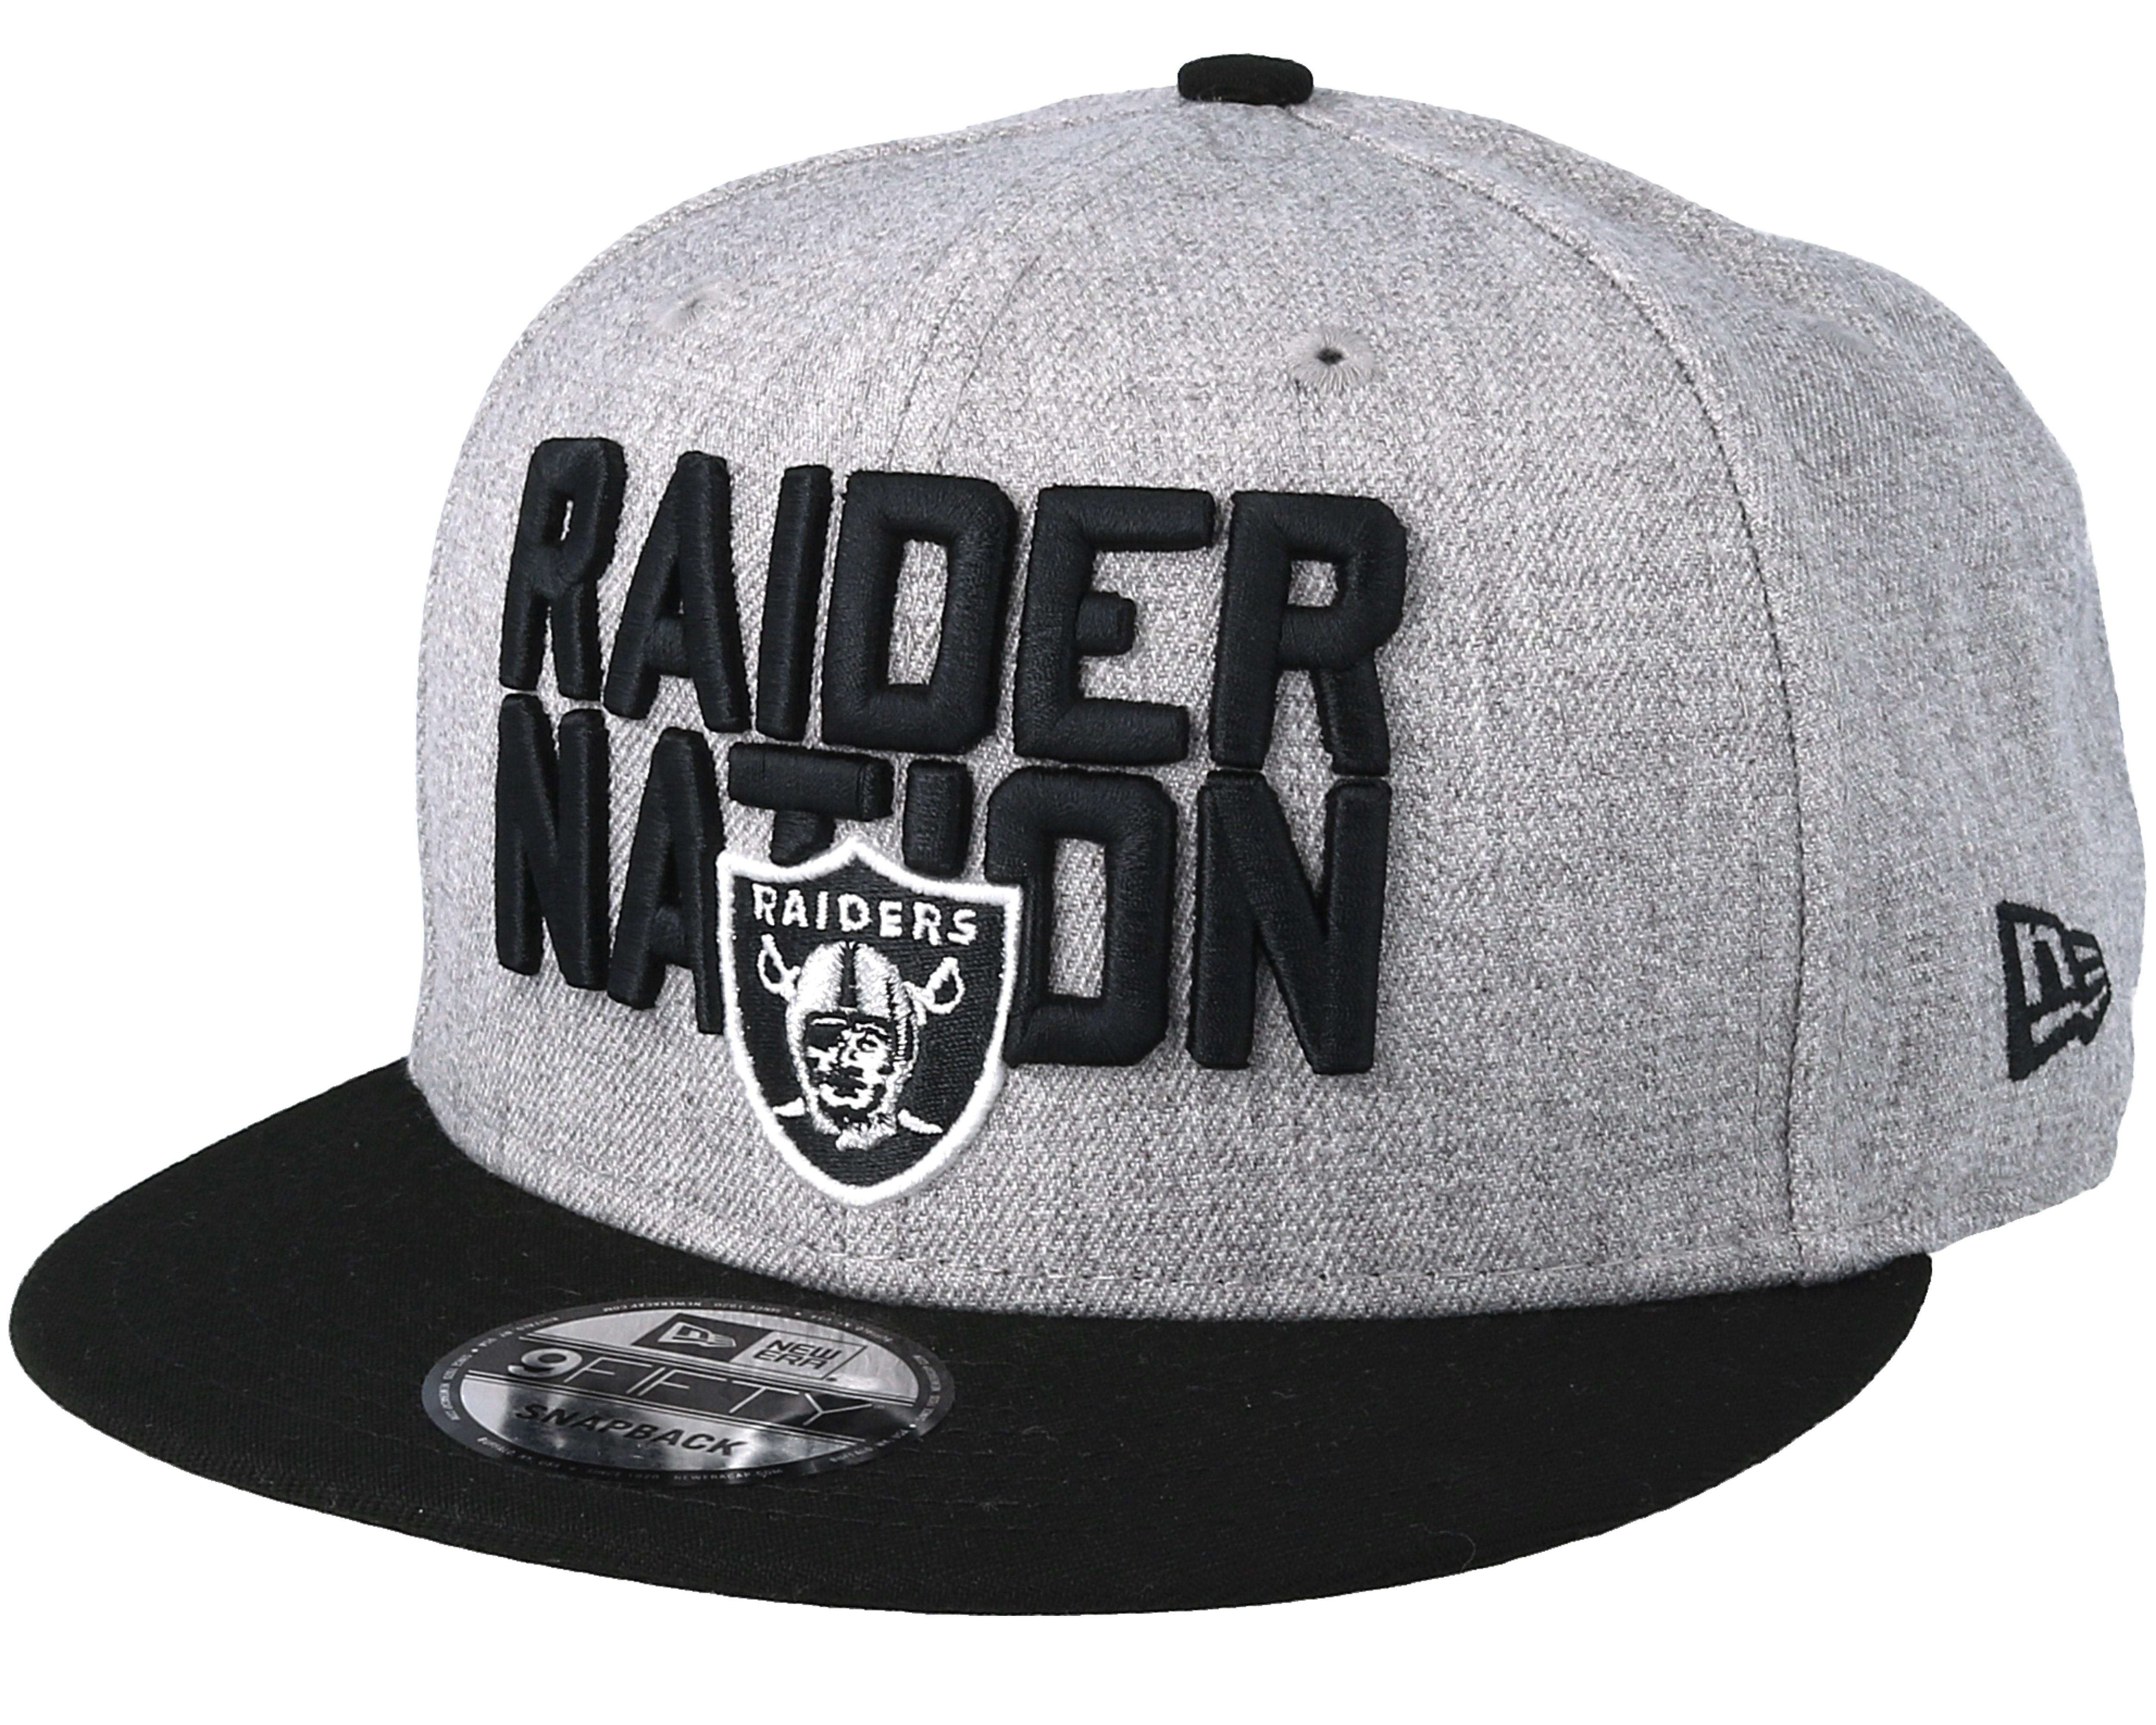 Oakland Raiders 2018 NFL Draft On-Stage Grey Black Snapback - New ... 2c703934e